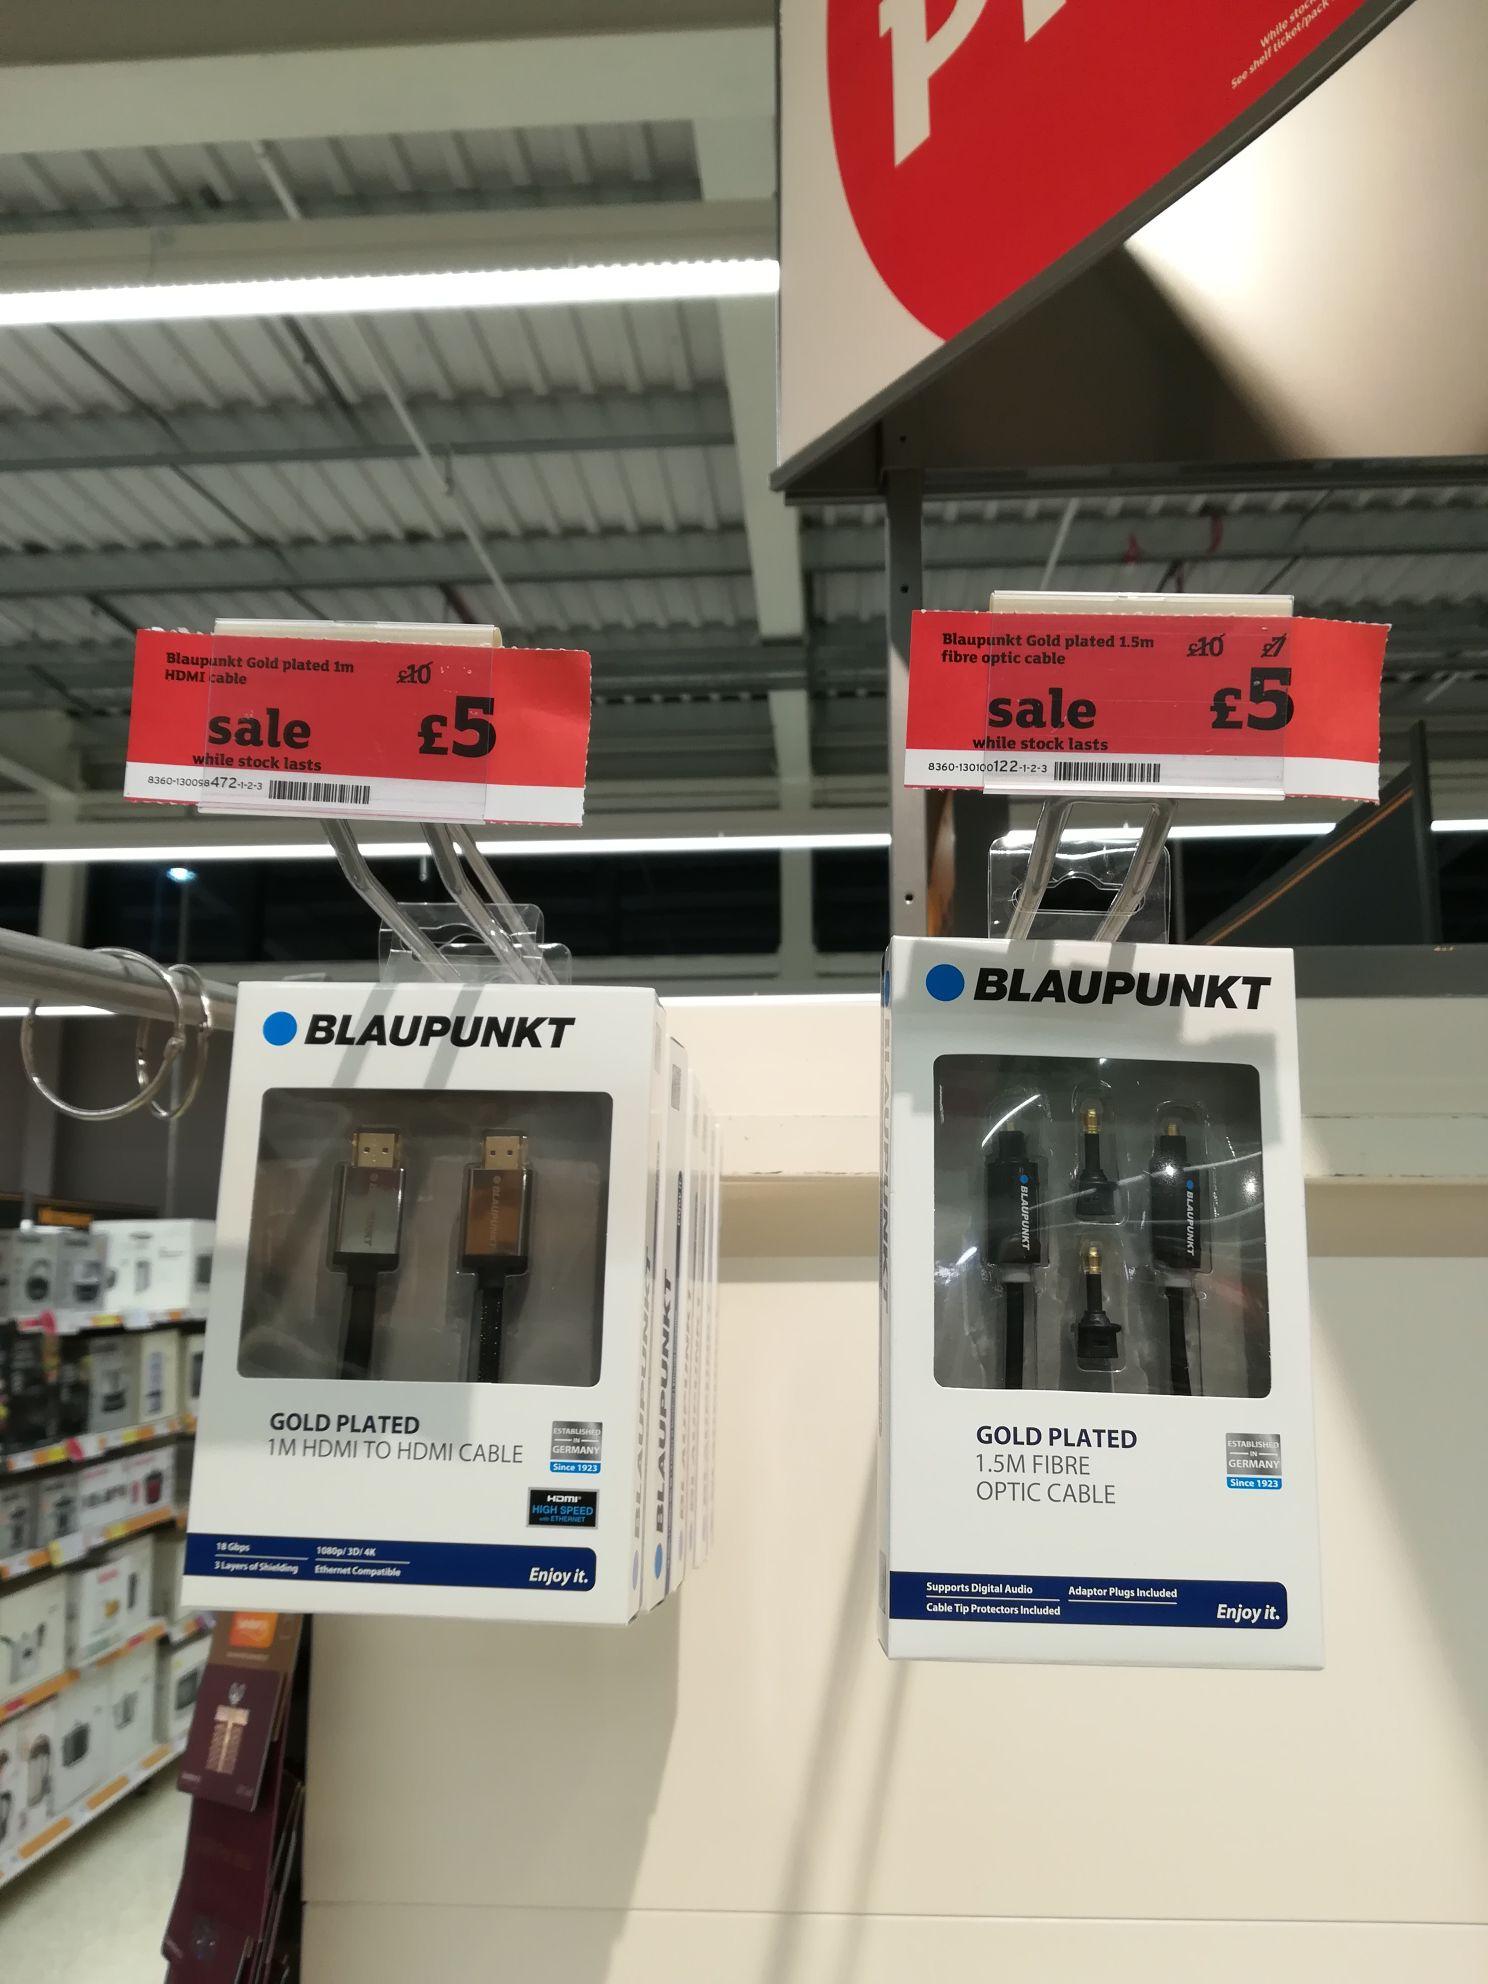 Blaupunkt HDMI or fibre optic cables half price (IN-STORE SAINSBURY'S) £5